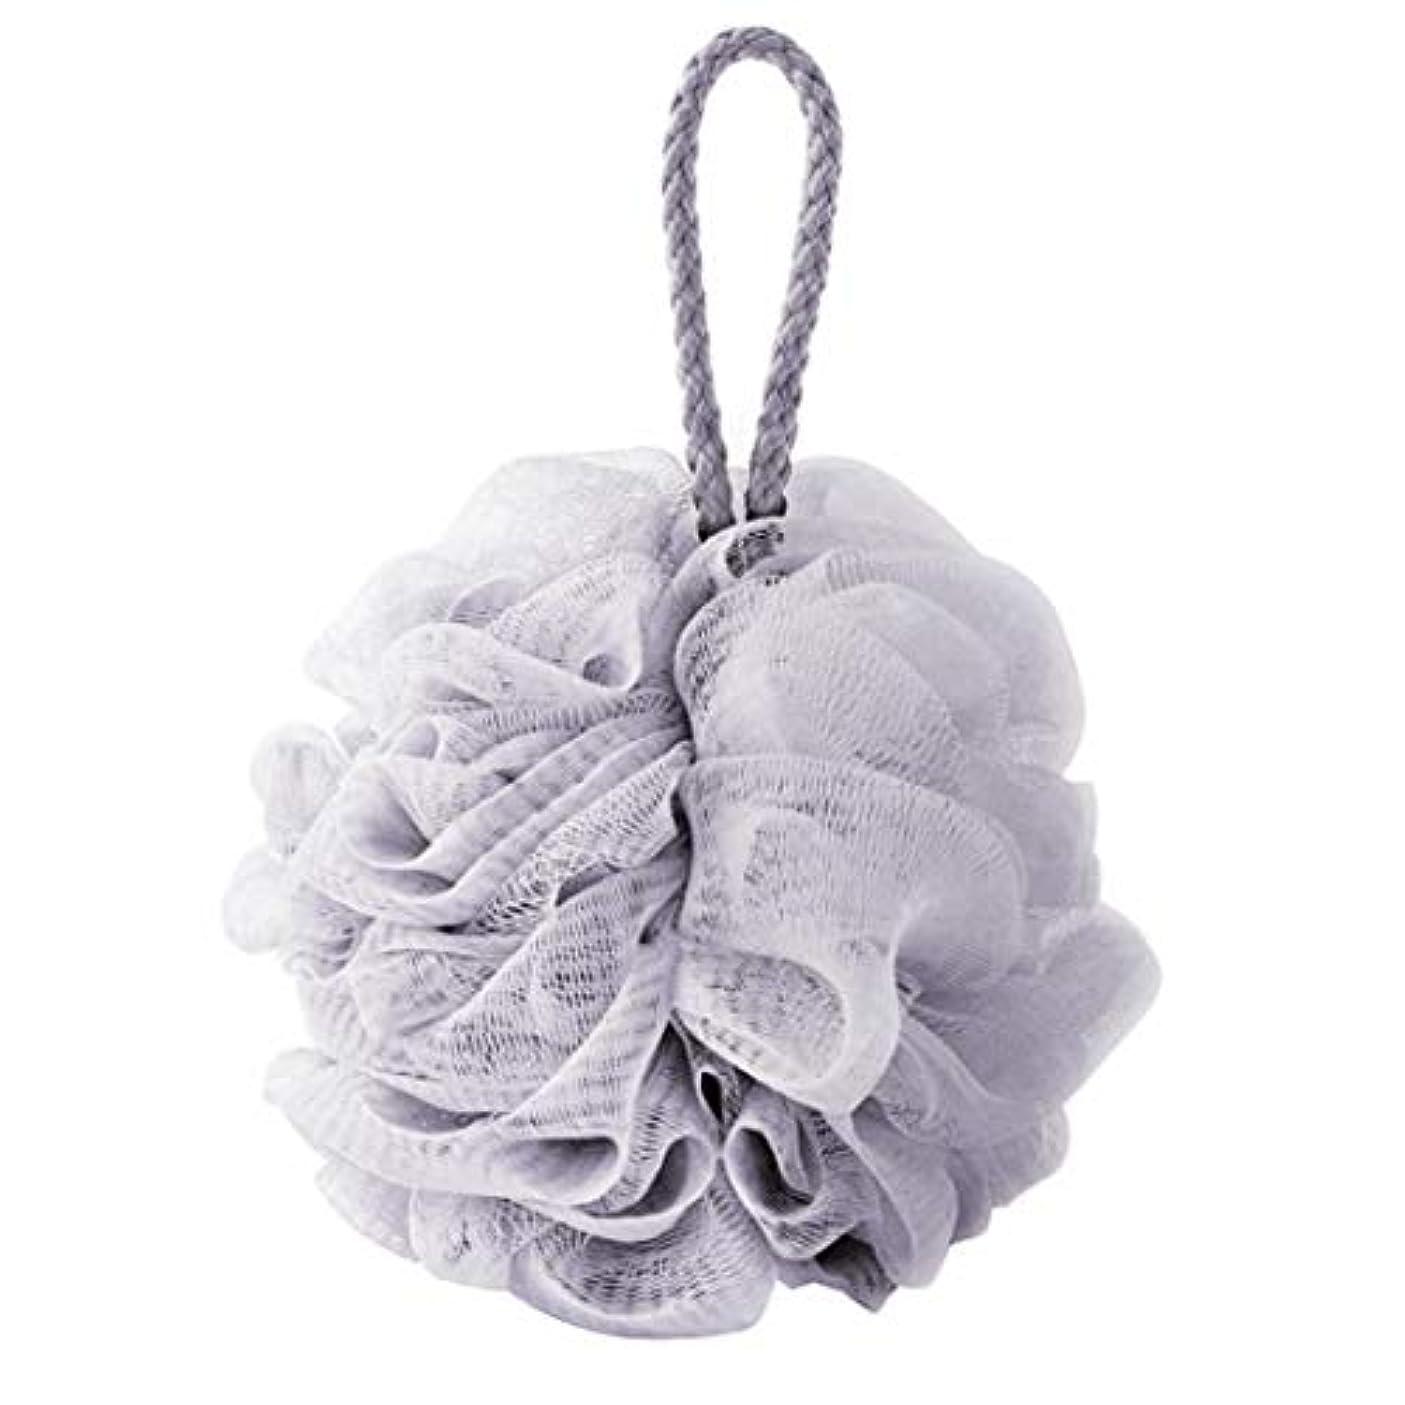 comentrisyzソフトシャワー入浴ボールブラシ泡泡ネットボディスクラブ洗浄ツール - ブルー